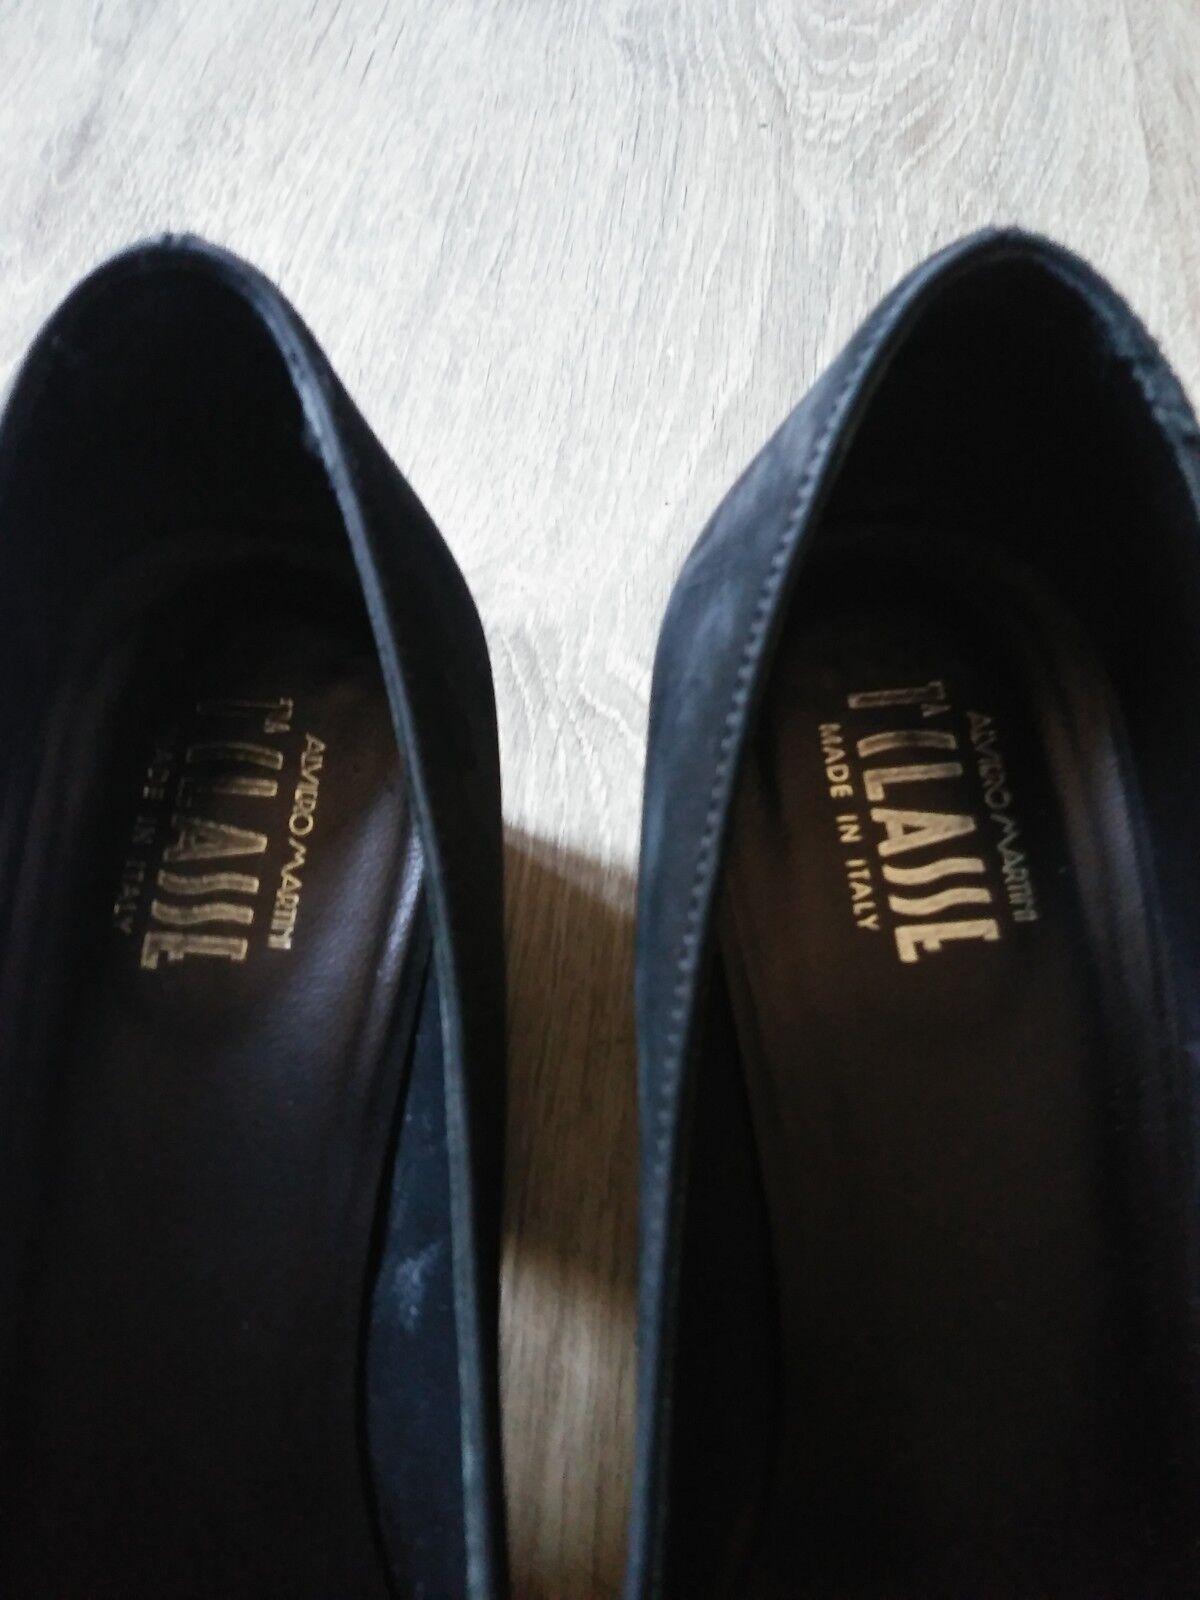 ALVIERO ALVIERO ALVIERO MARTINI 1a CLASSE zapatos NR.37 0917a3